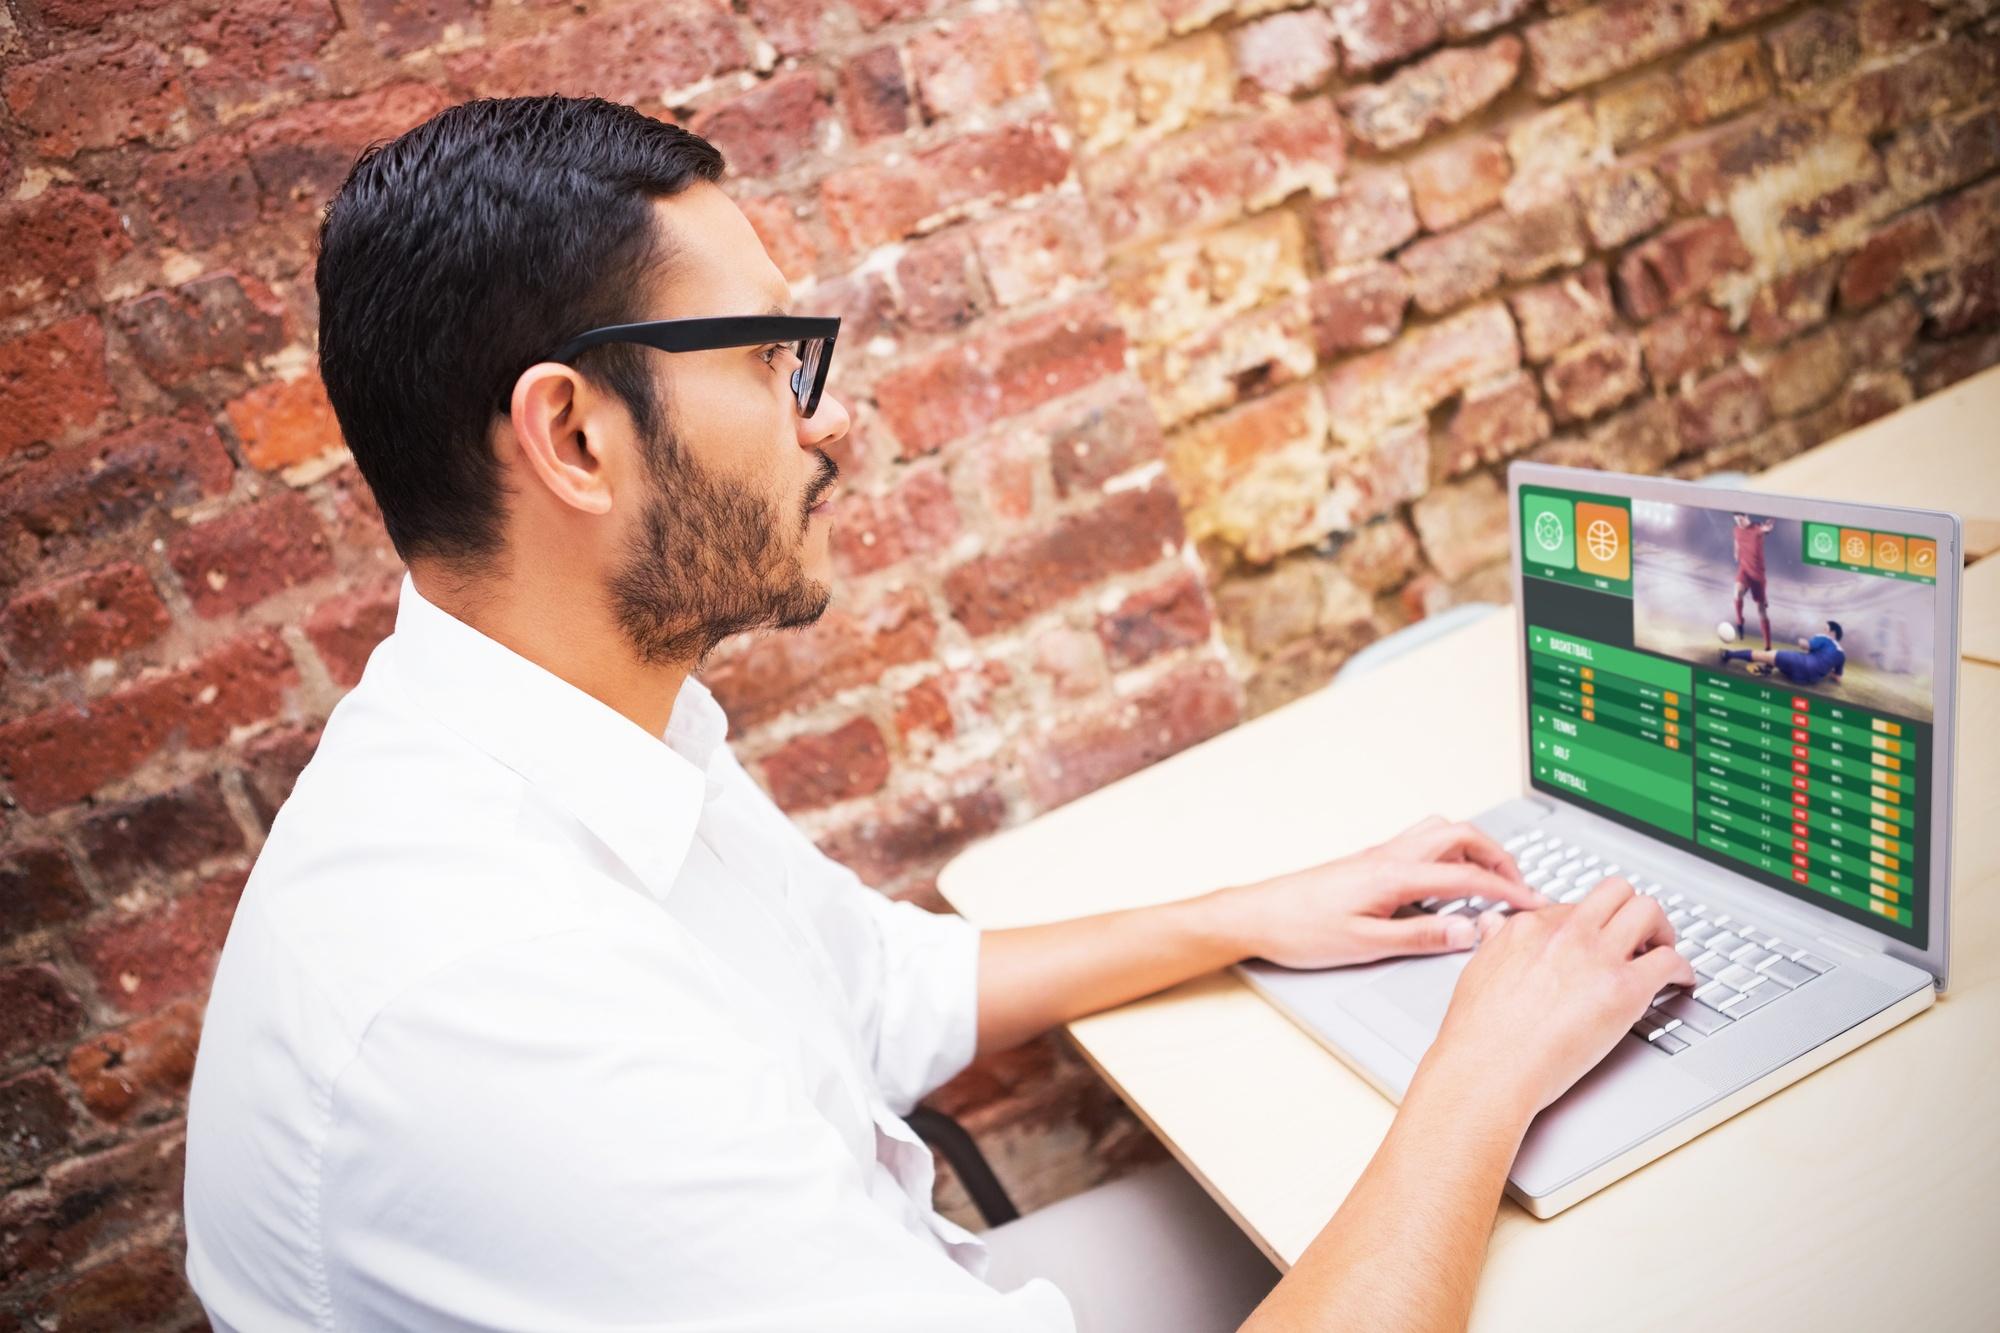 Betting hedge psisyndicate csgo betting analysis